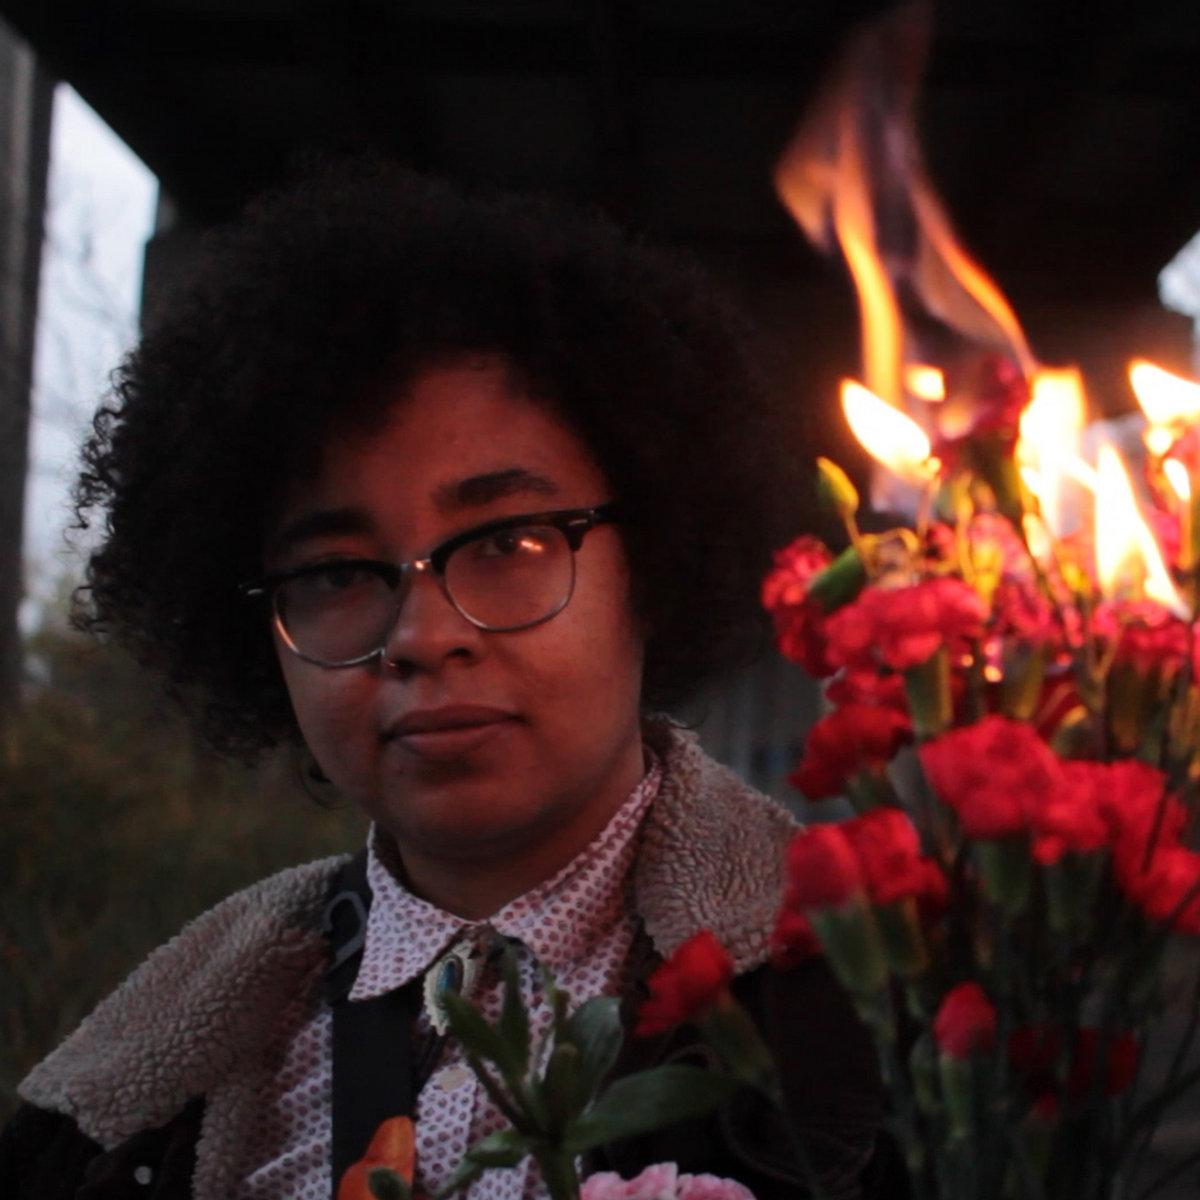 Singer of Rest Ashore Burning Roses Up Close